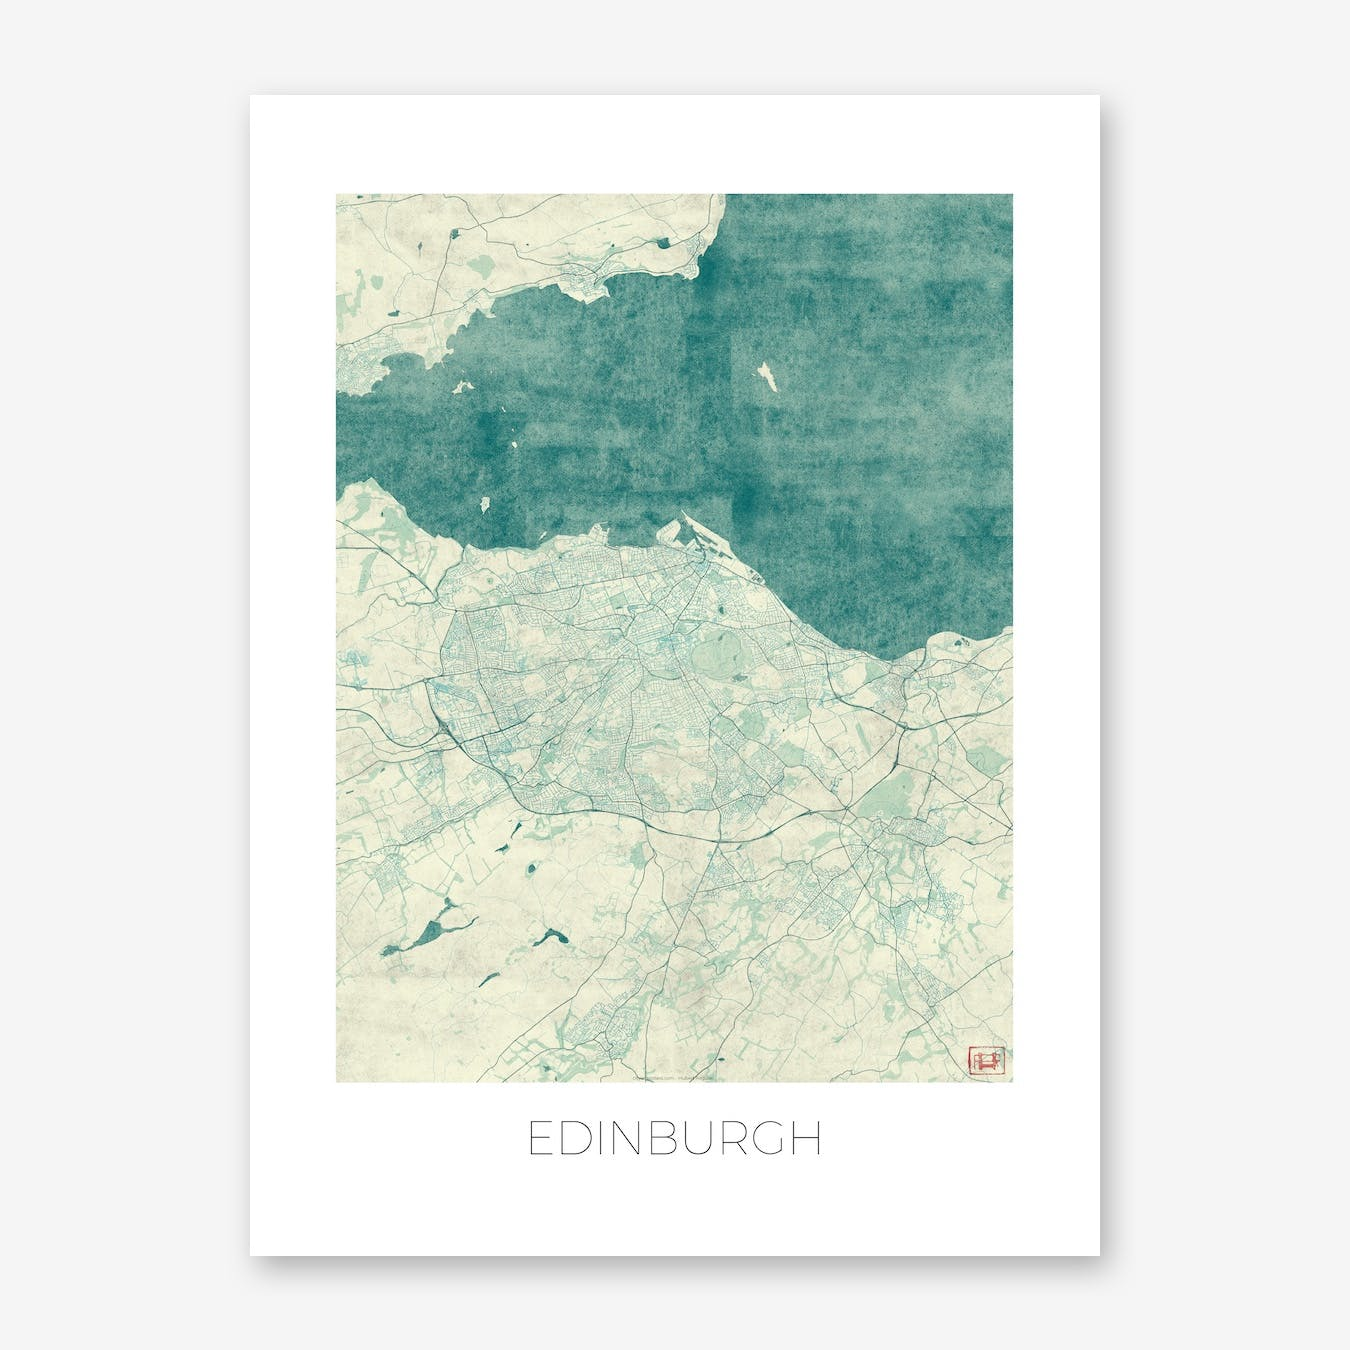 Edinburgh Map Vintage in Blue